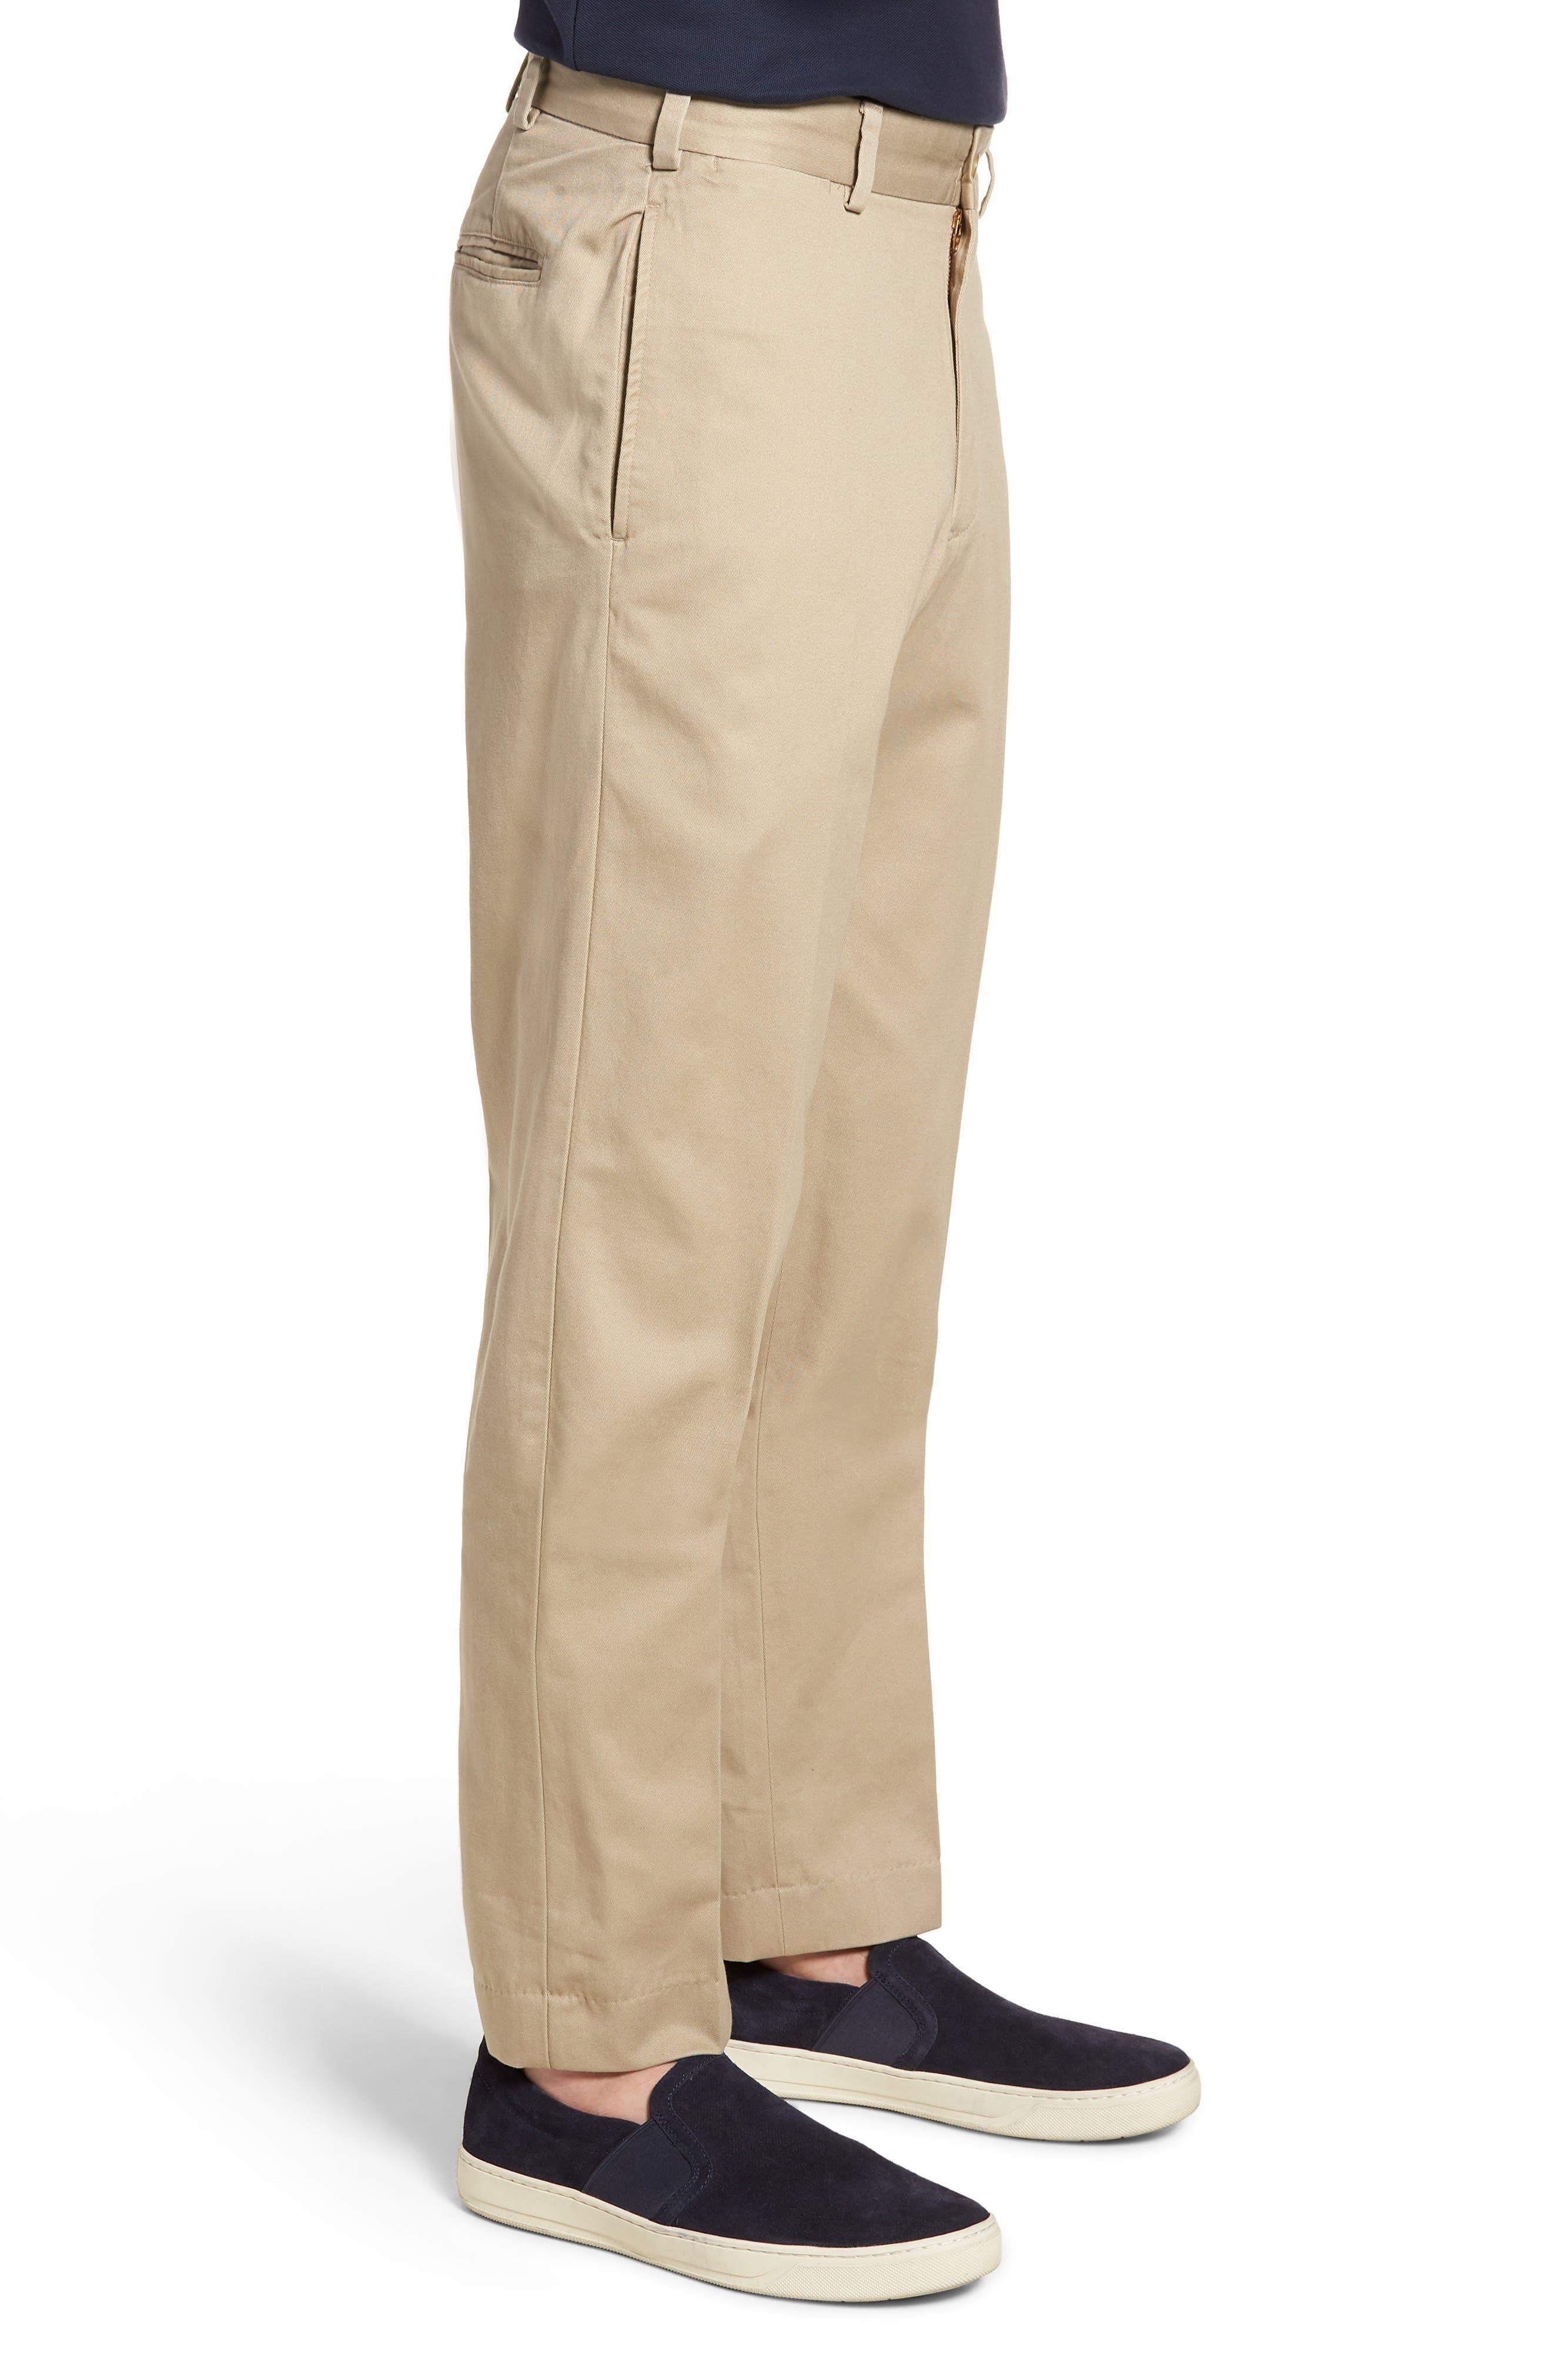 M2 Classic Fit Vintage Twill Flat Front Pants,                             Alternate thumbnail 3, color,                             Khaki